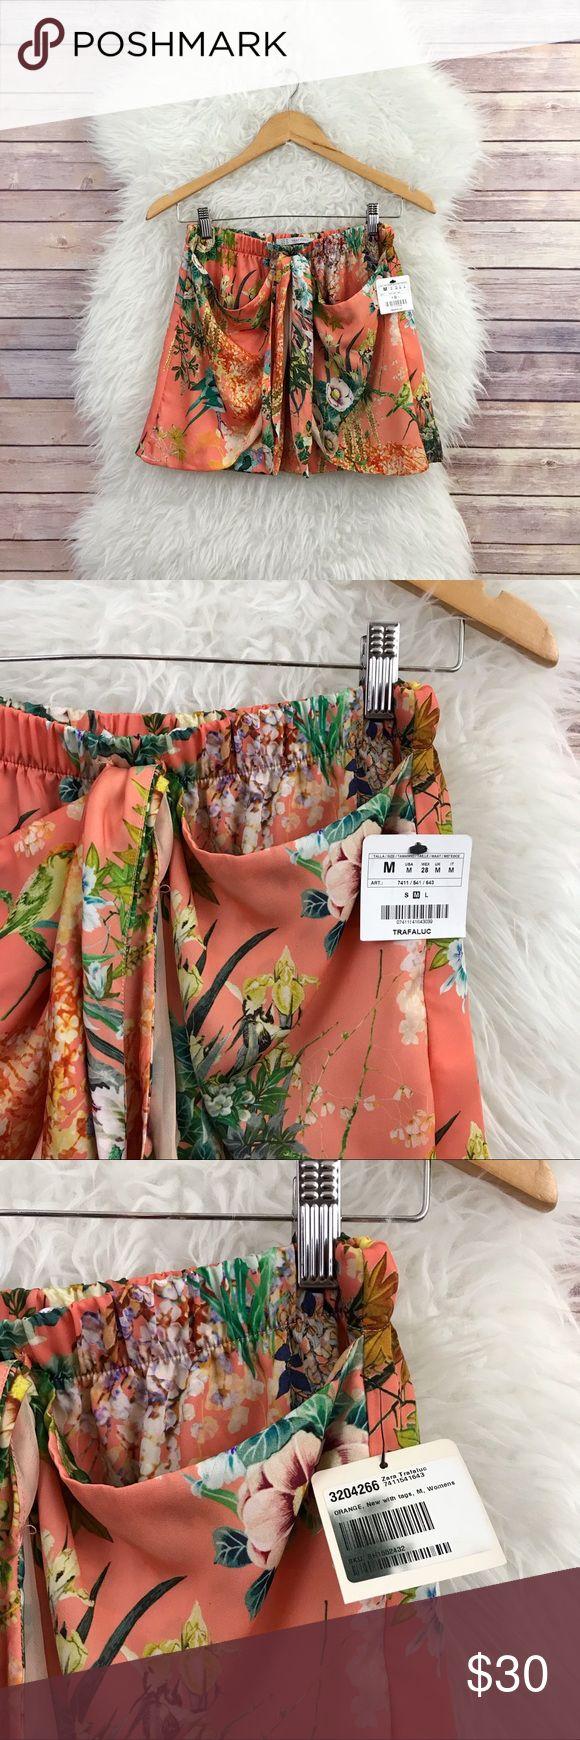 "New Zara Tropical Floral Sarong Skirt Sz M New Zara Trafaluc skirt. Size M.  // D E T A I L S ✿ * Floral print * Sarong style  * Elasticized waist  // M E A S U R E M E N T S ✿ * Waist: 13"" inches across * Length: 14.5"" inches Zara Skirts"